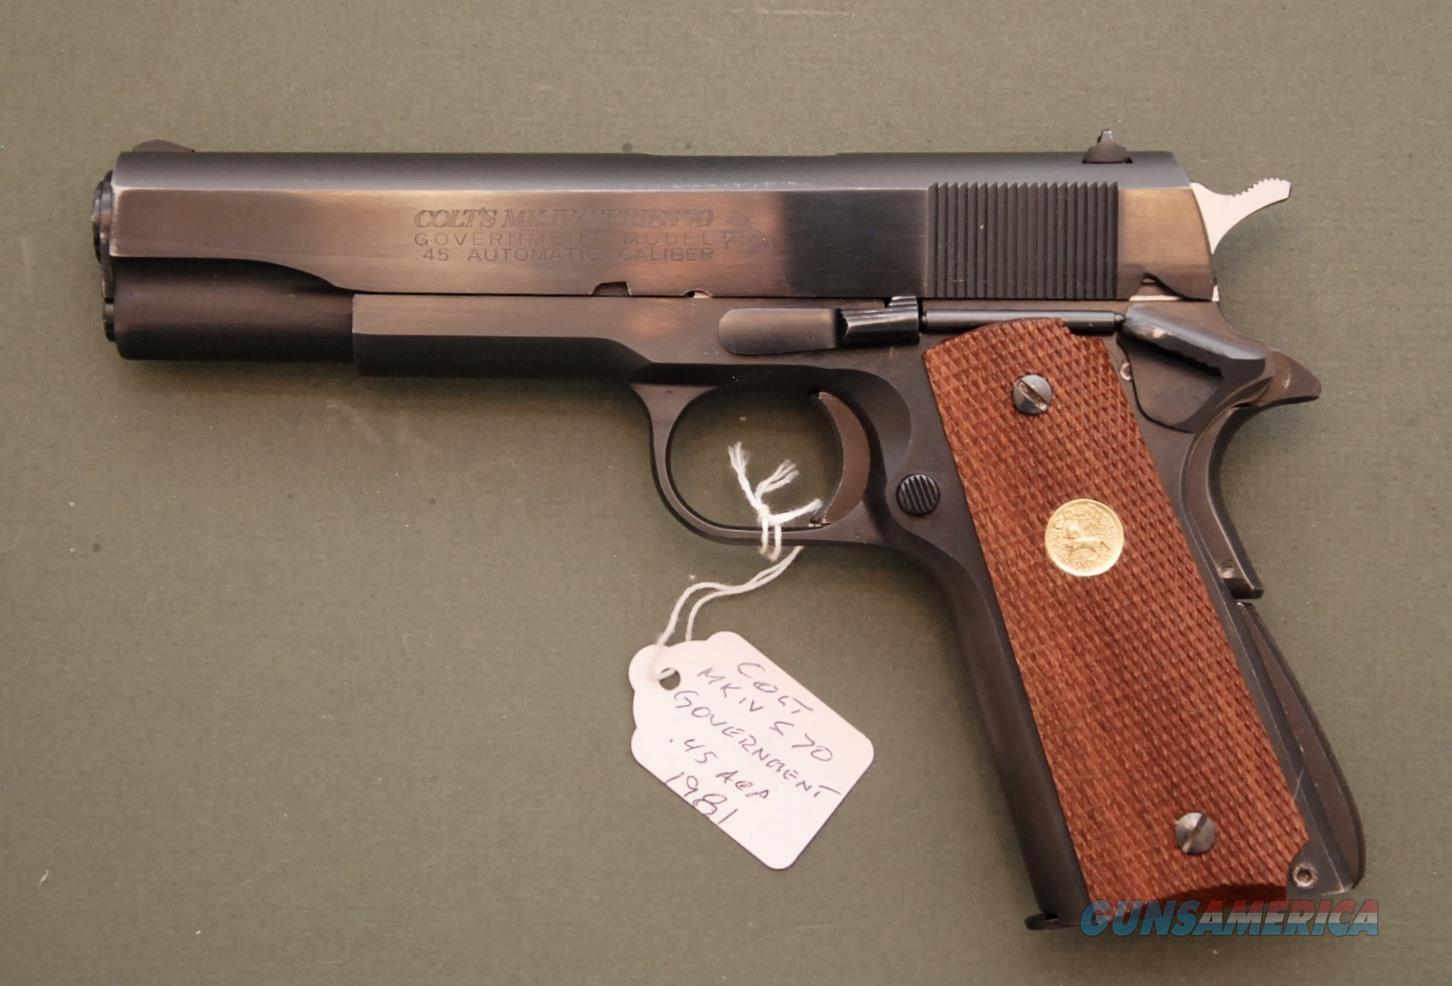 Colt MK IV Series 70 Government Model .45 ACP  Guns > Pistols > Colt Automatic Pistols (1911 & Var)